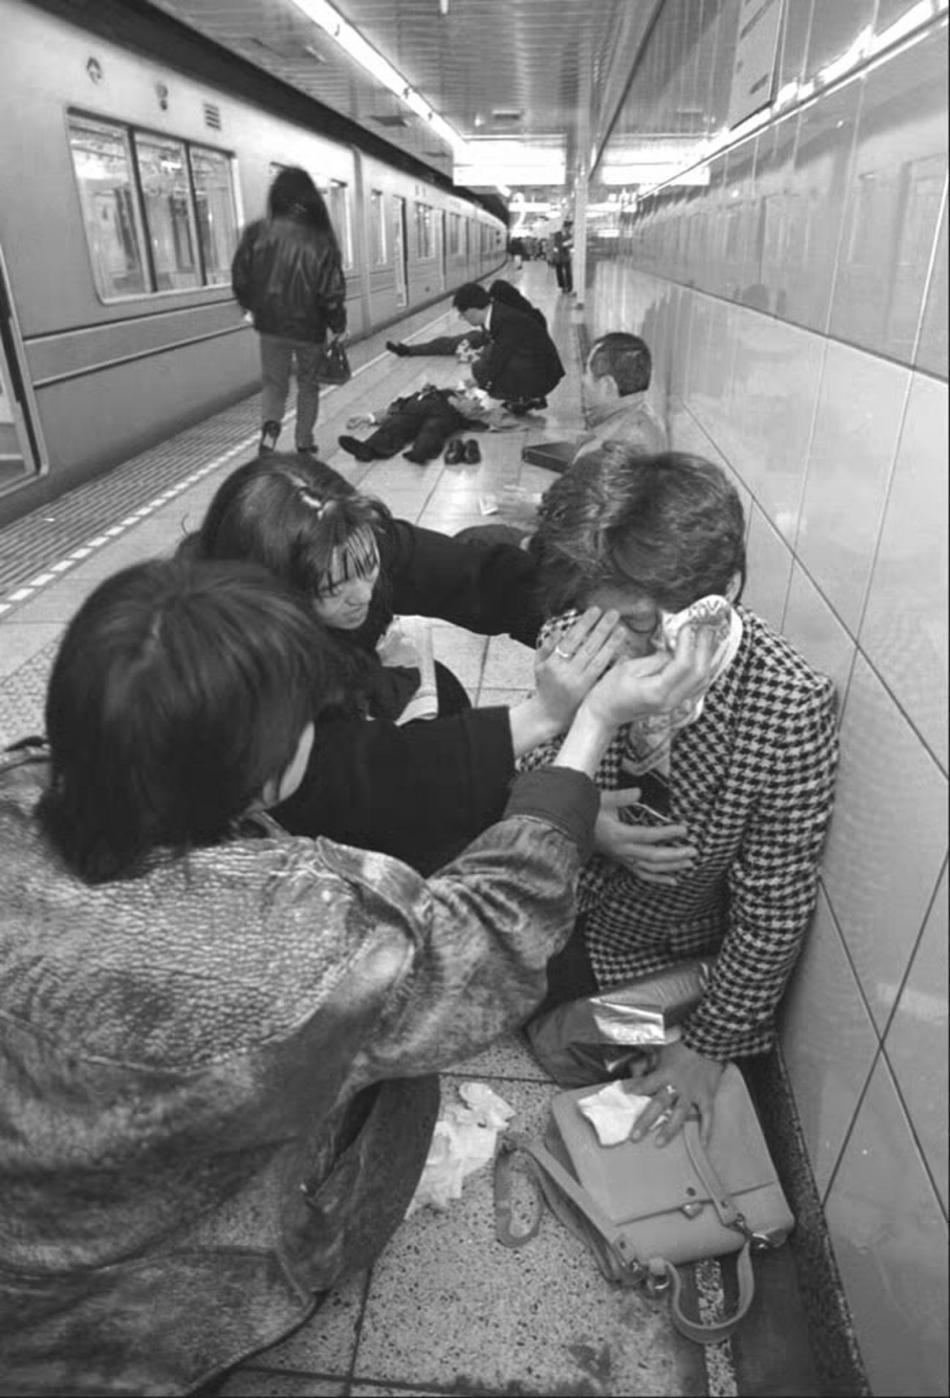 Útok sarinem v tokijském metru v roce 1995